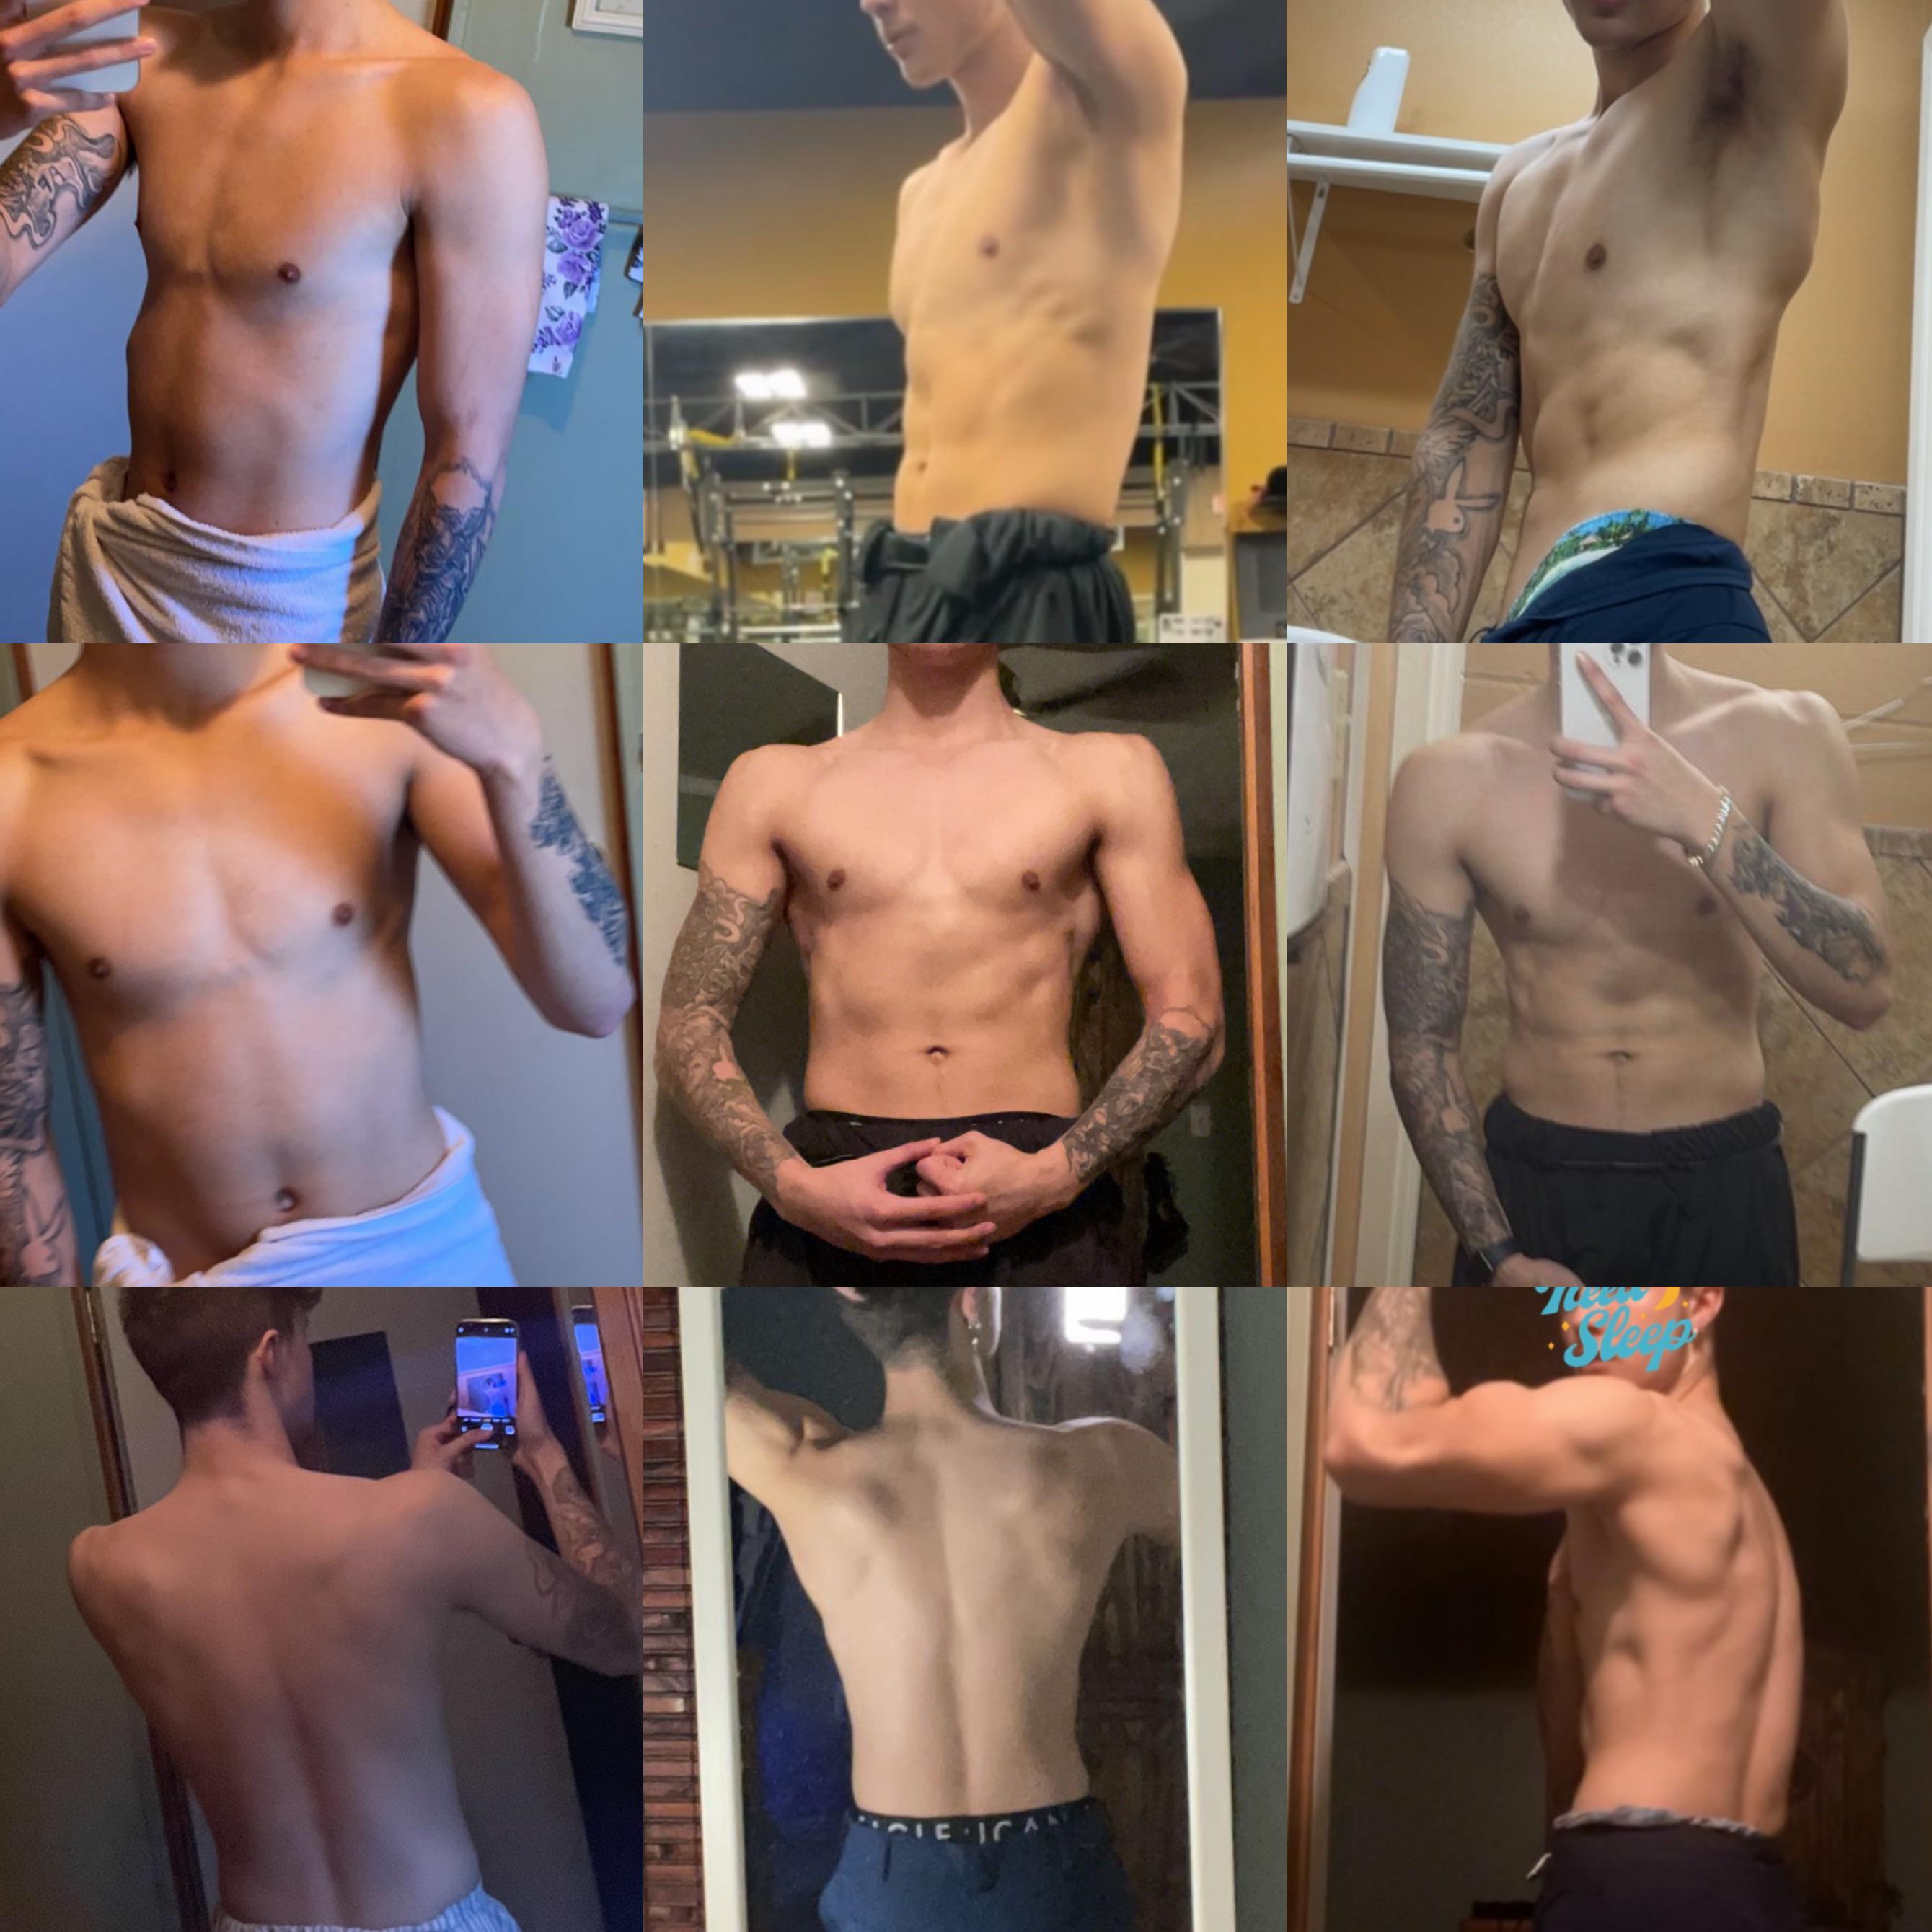 5'9 Male Progress Pics of 15 lbs Weight Gain 115 lbs to 130 lbs